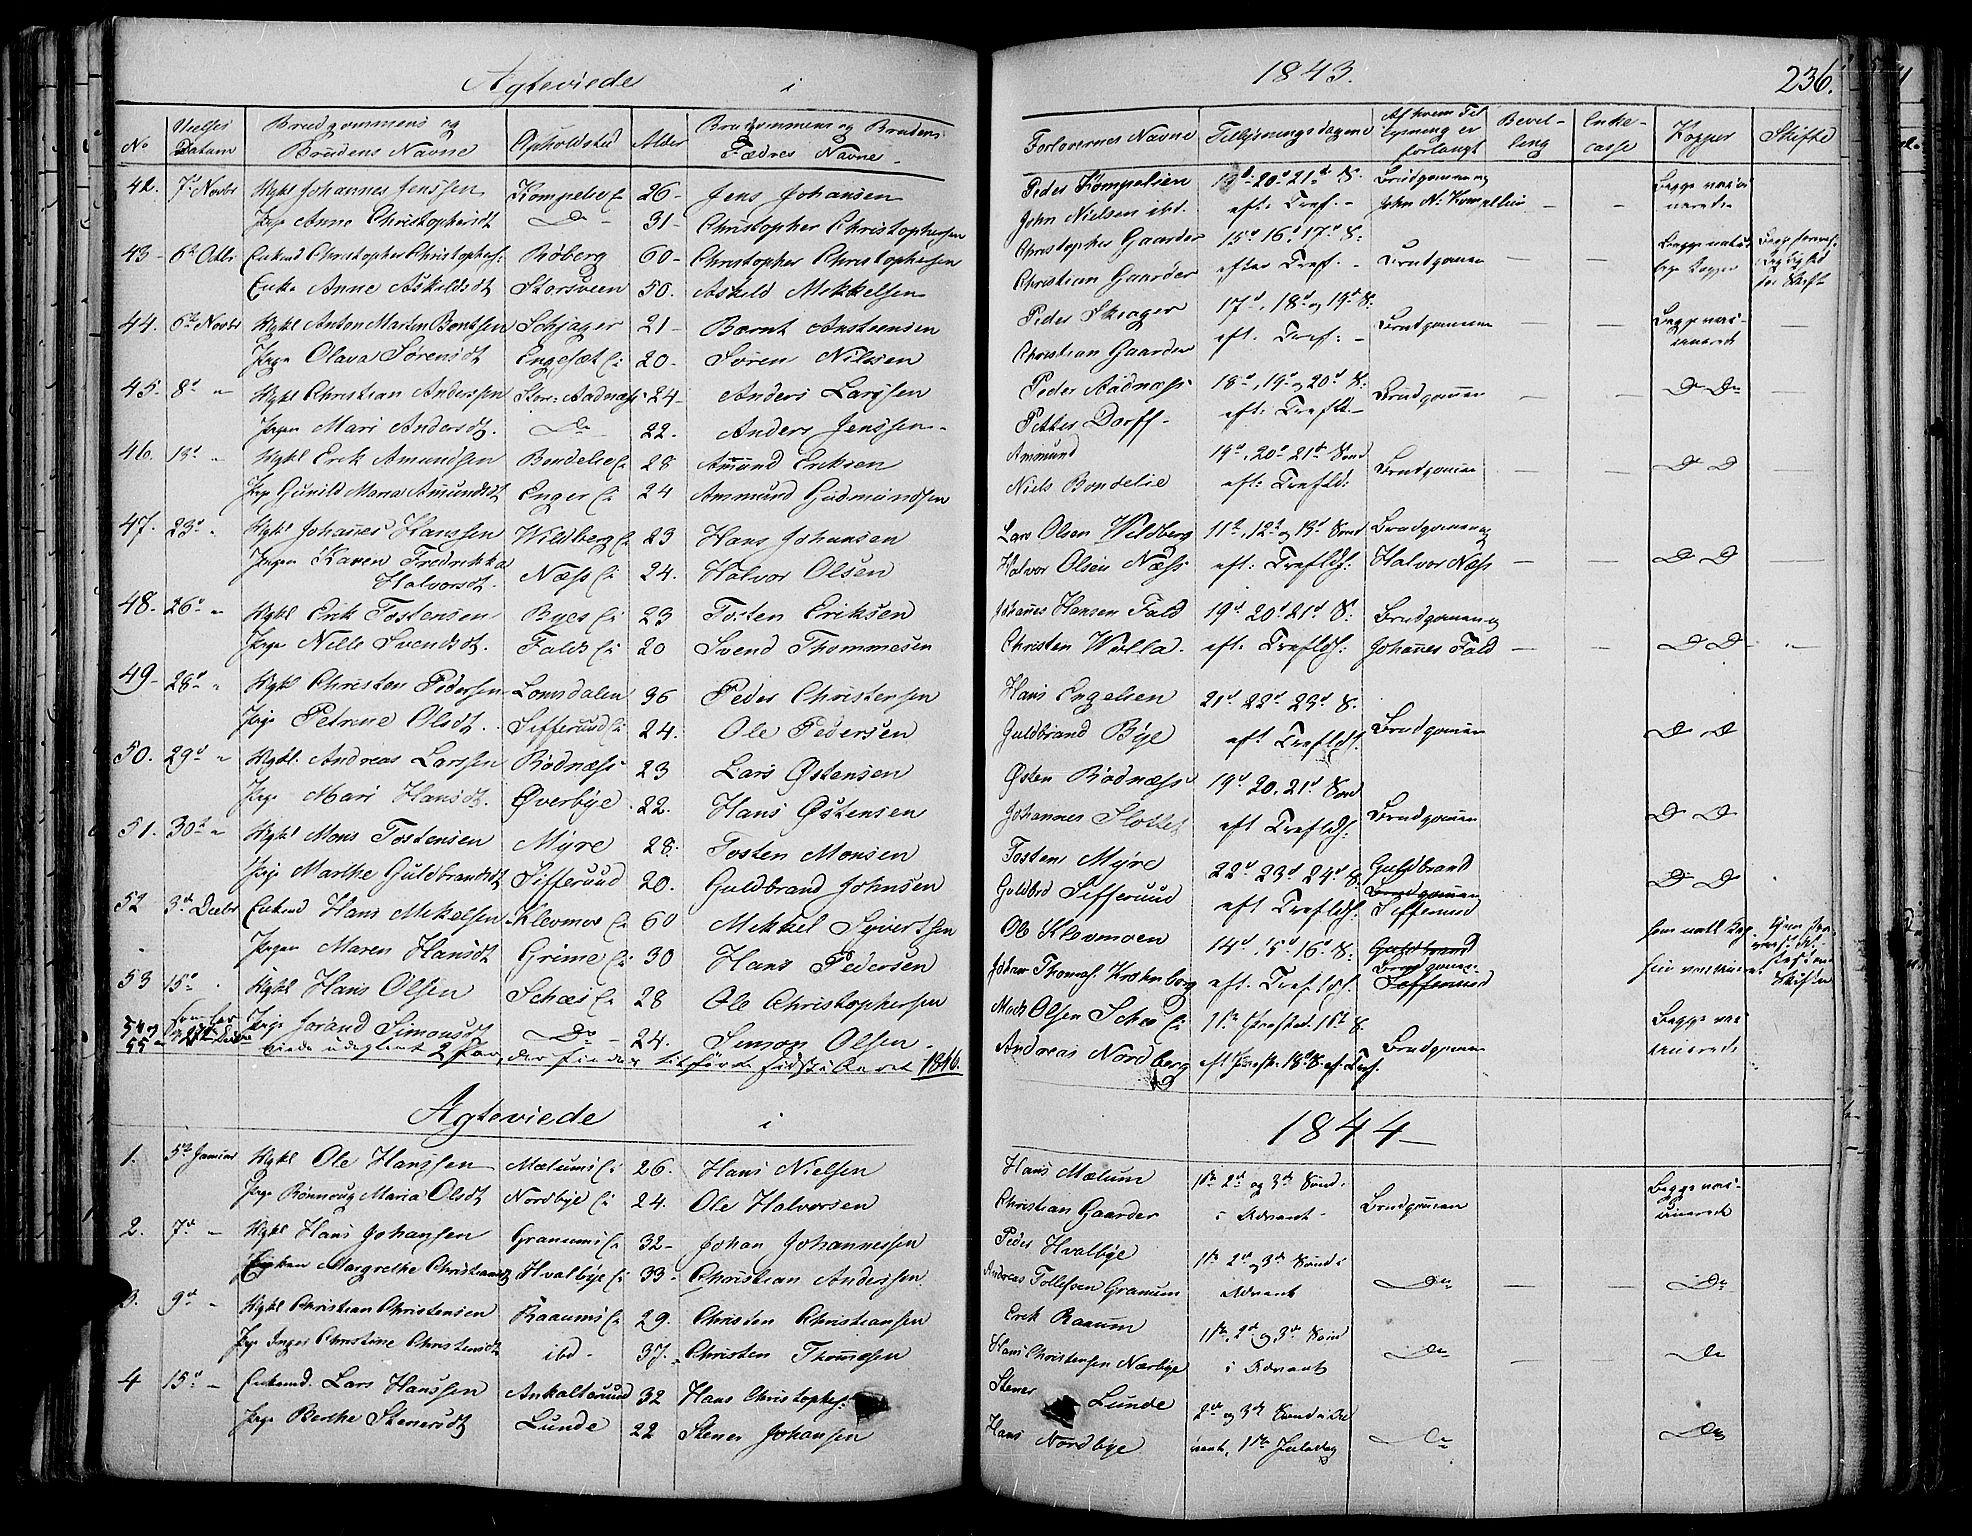 SAH, Land prestekontor, Ministerialbok nr. 8, 1830-1846, s. 236